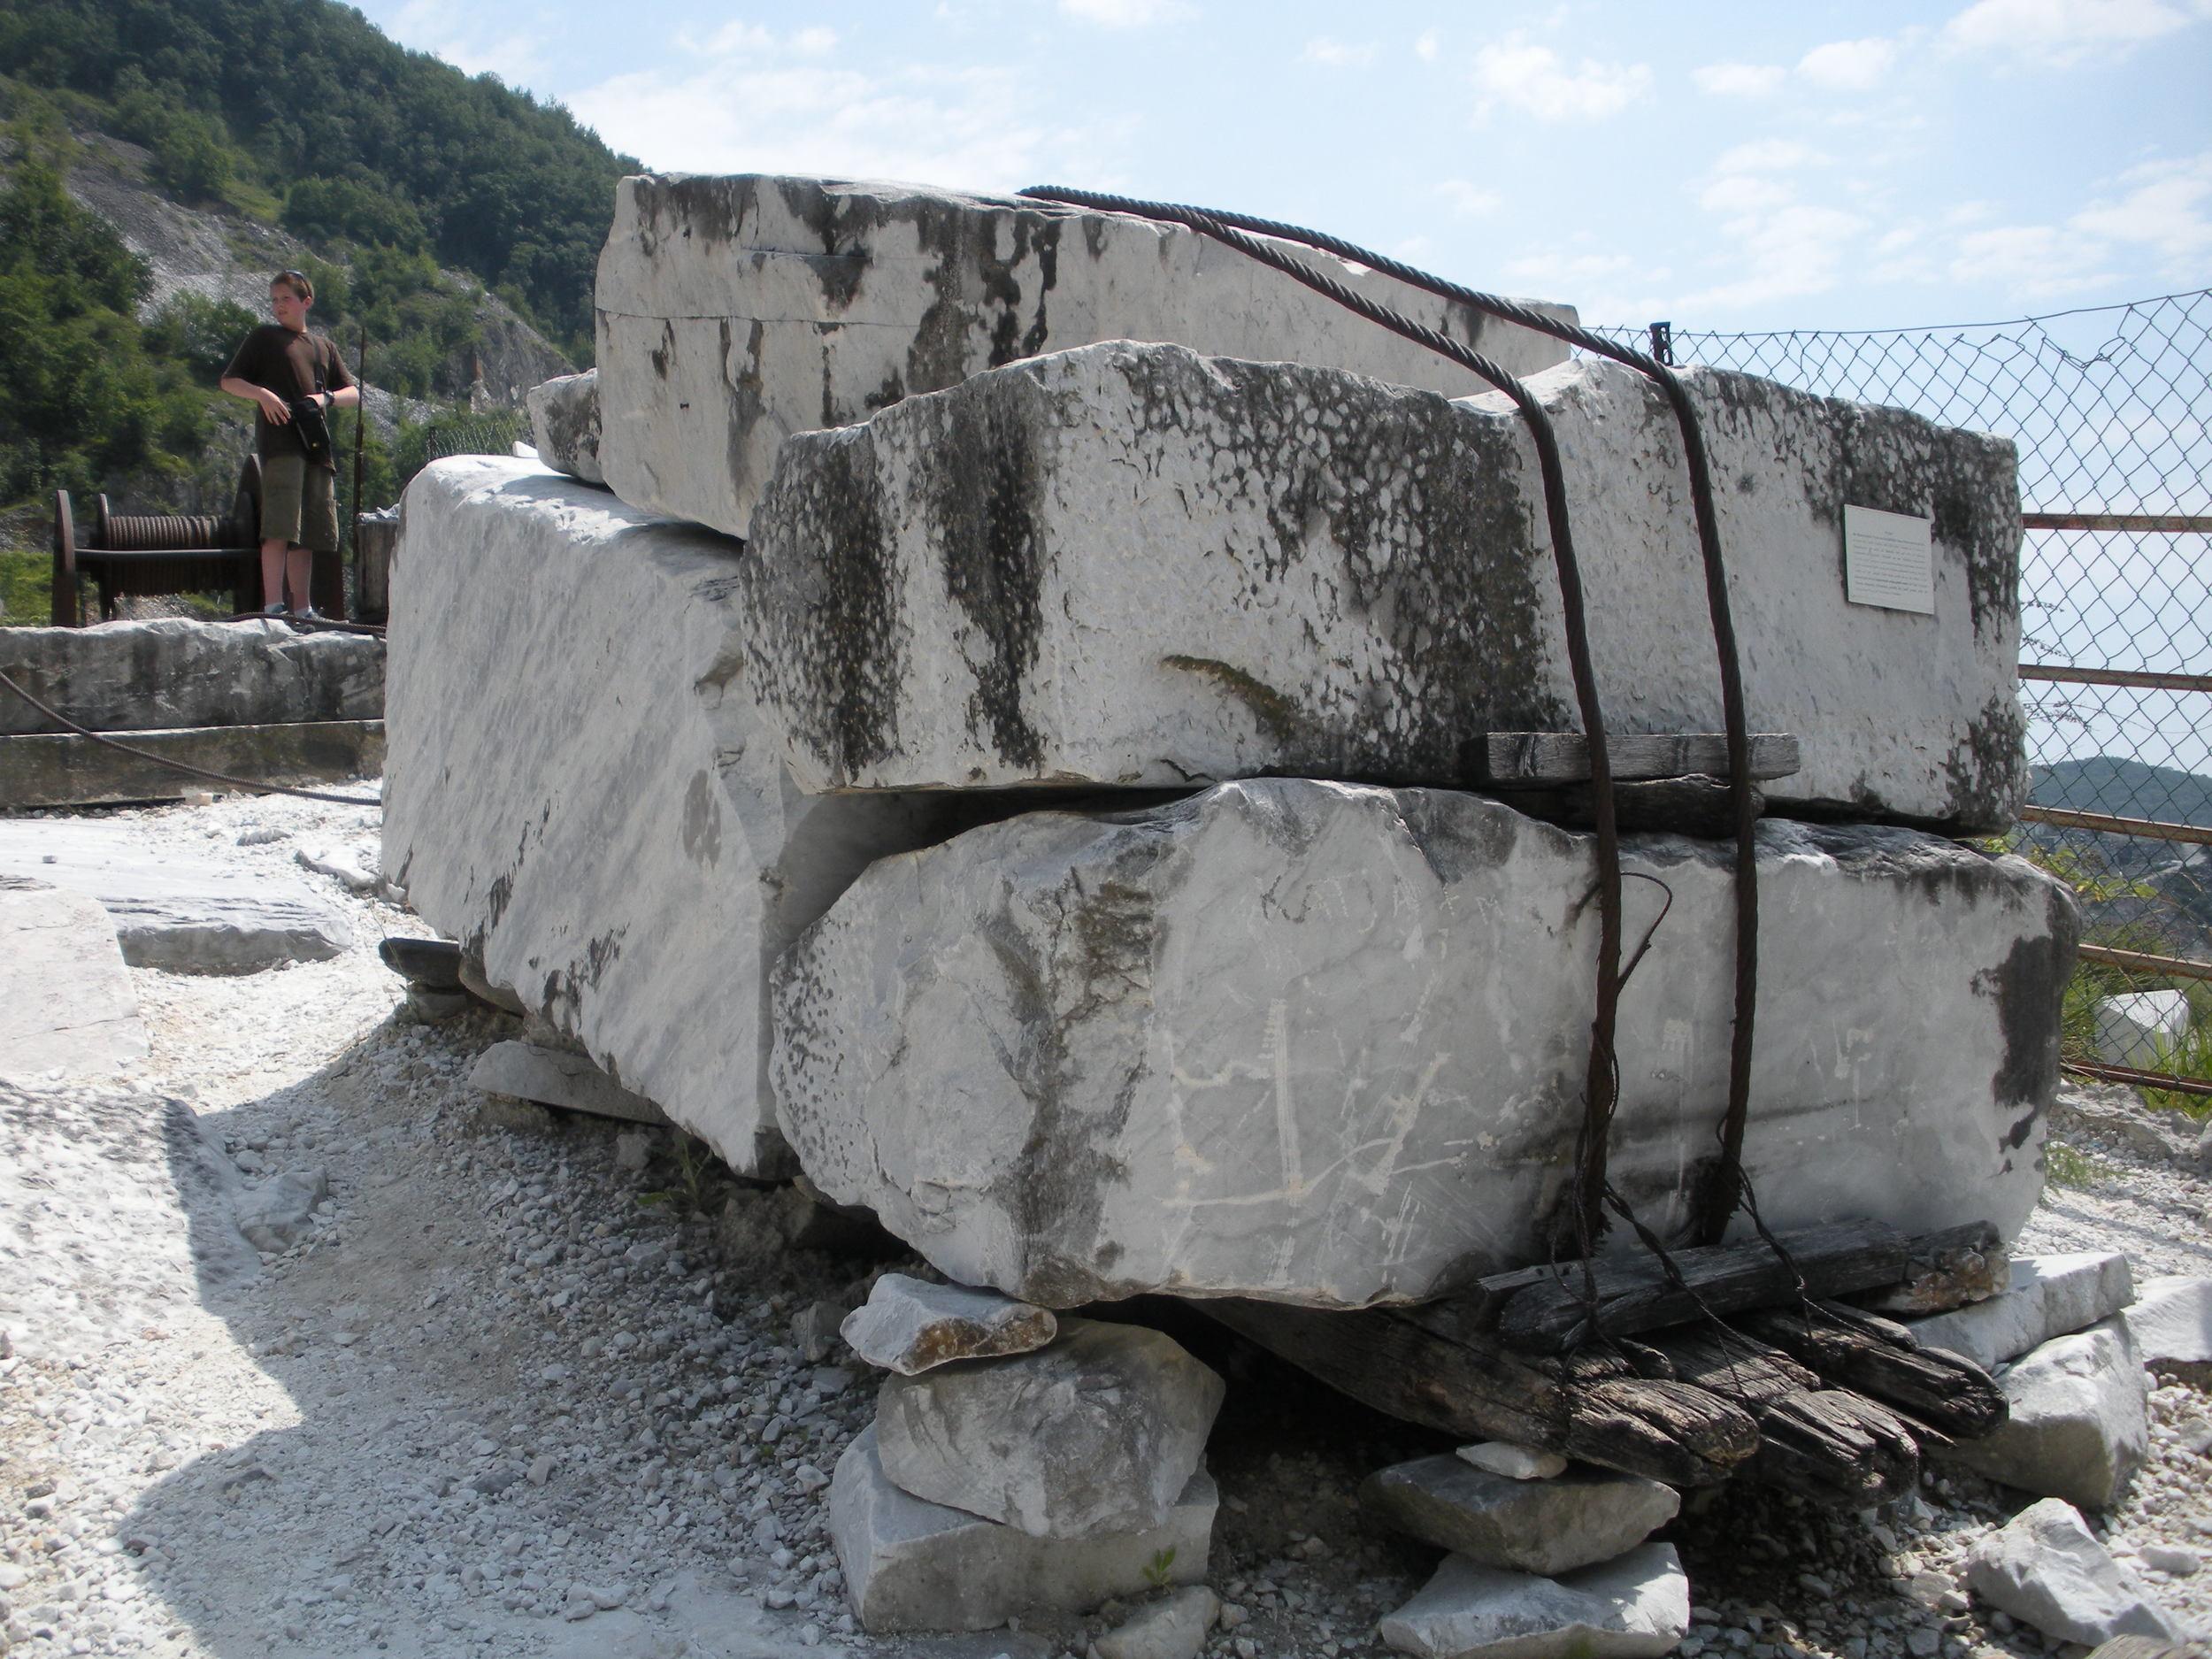 Massa Carrara marble ready for sculpting